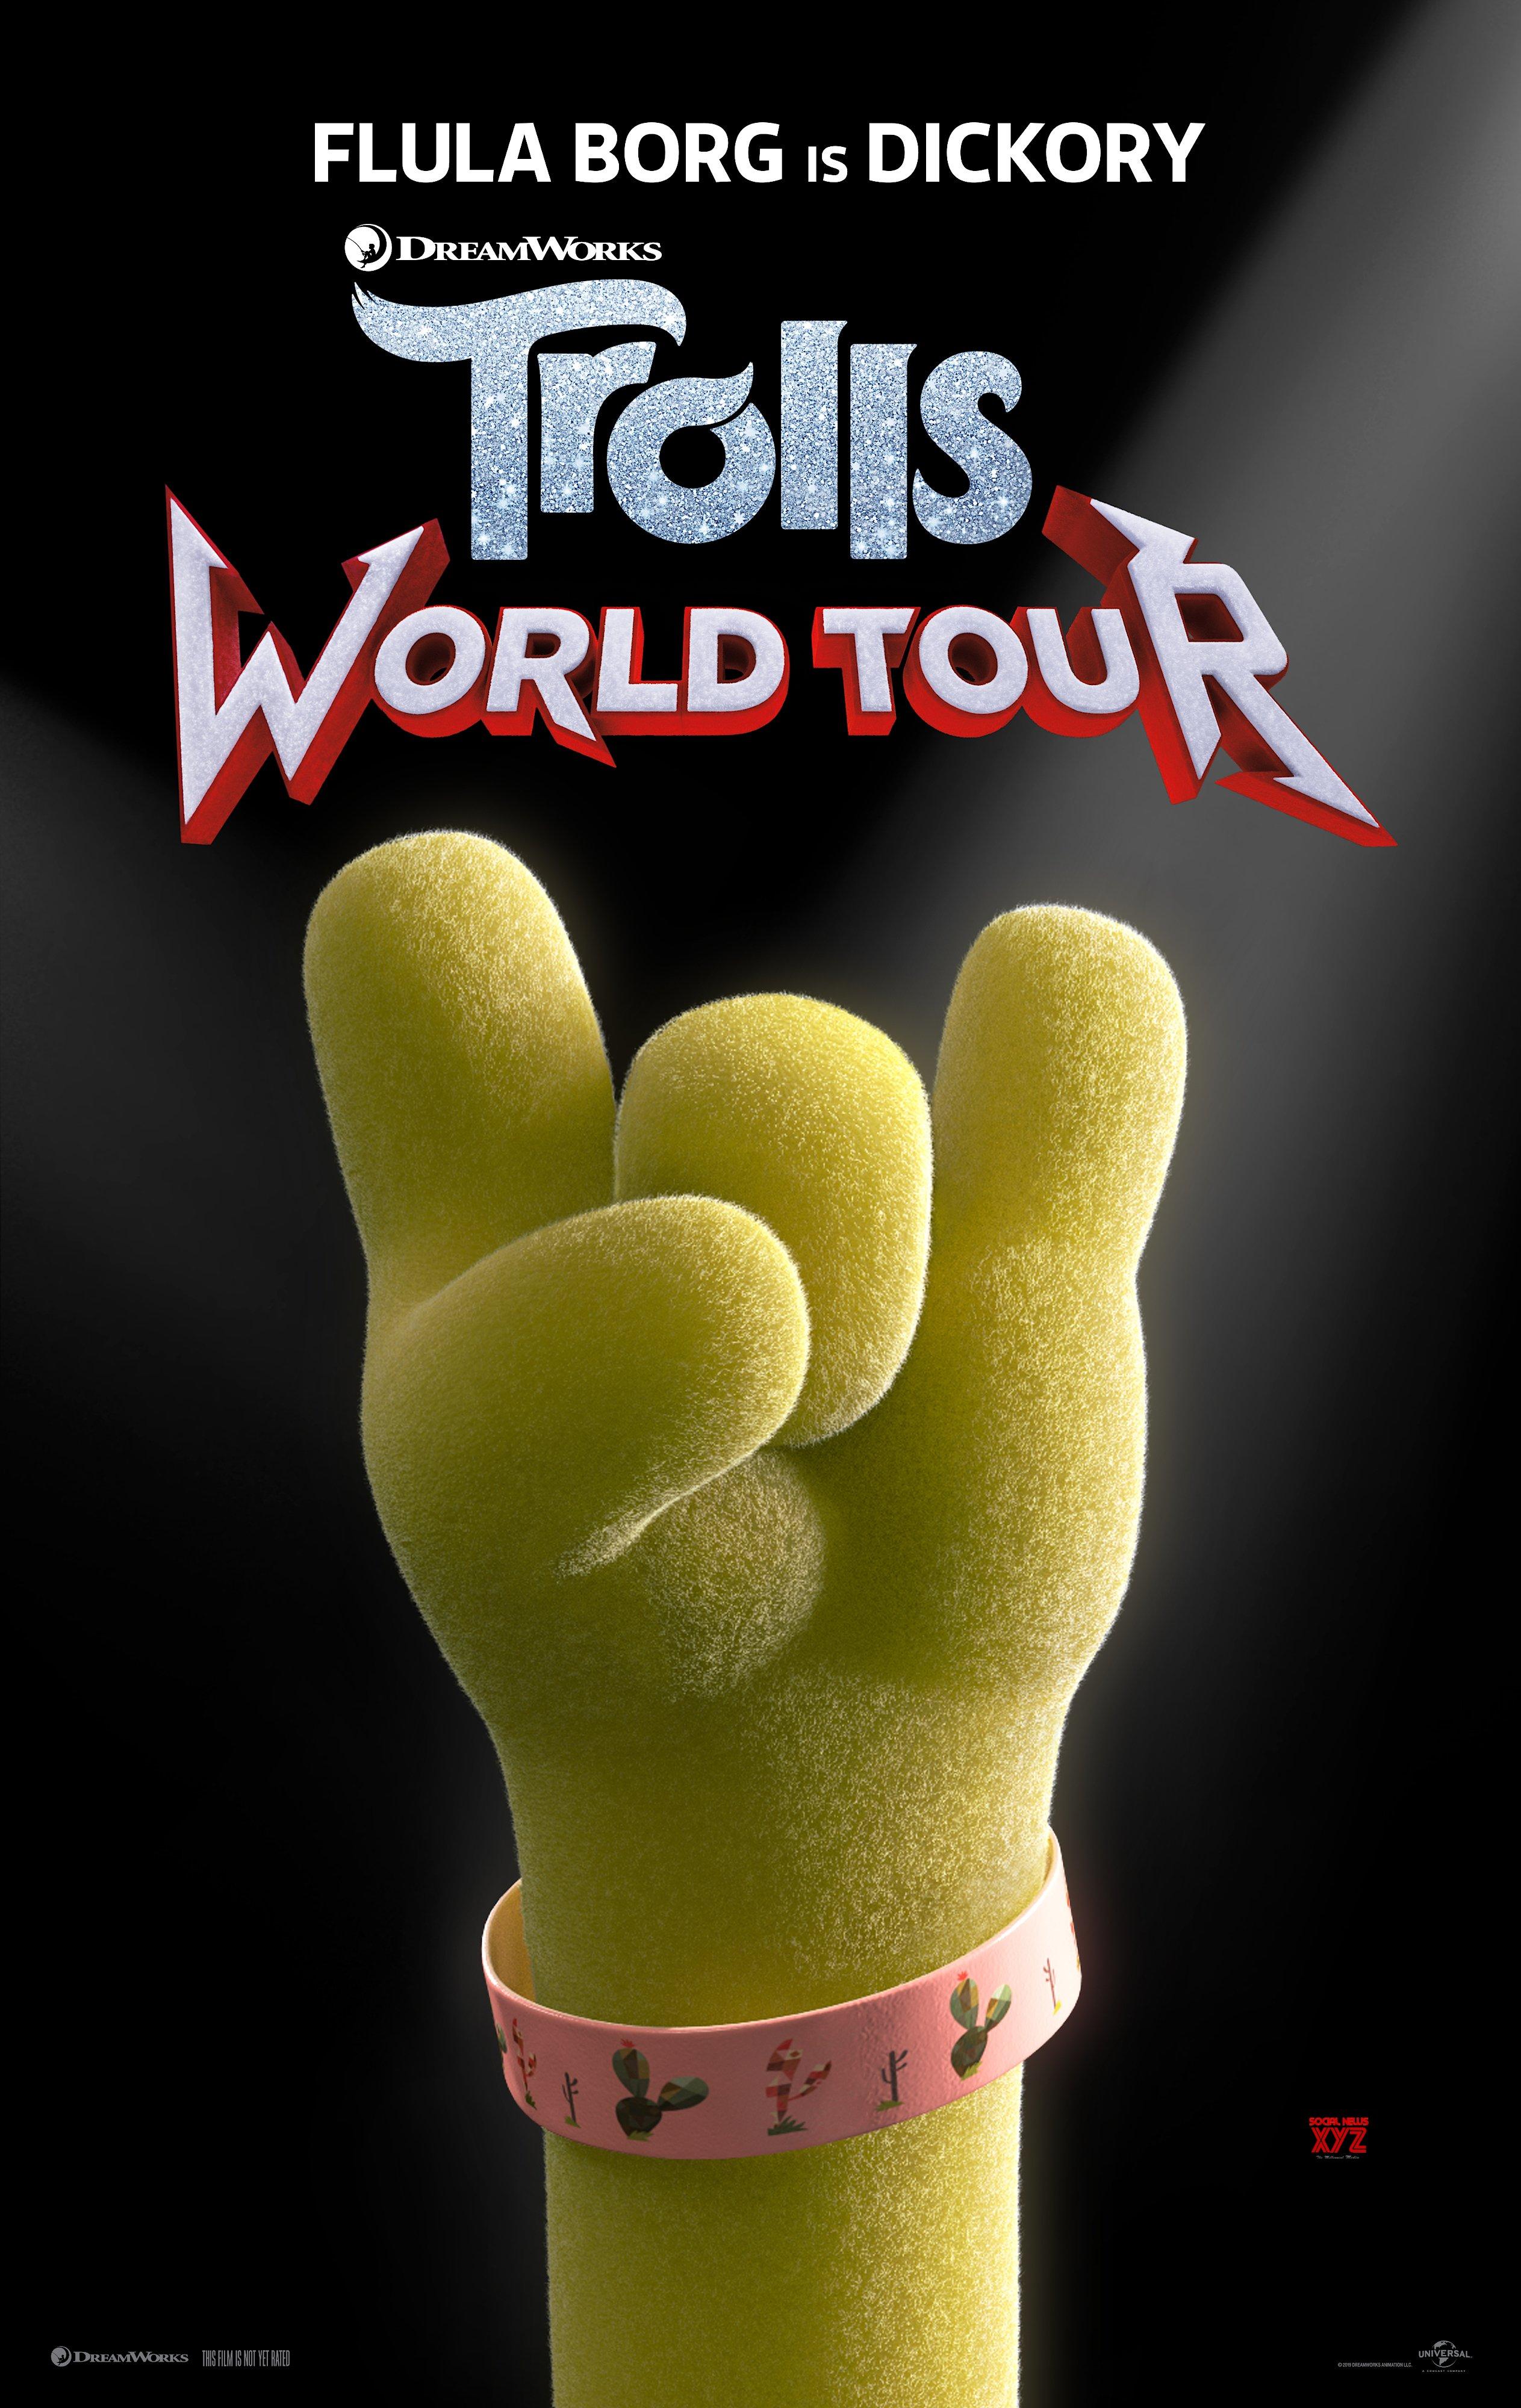 Trolls World Tour Movie Production Notes